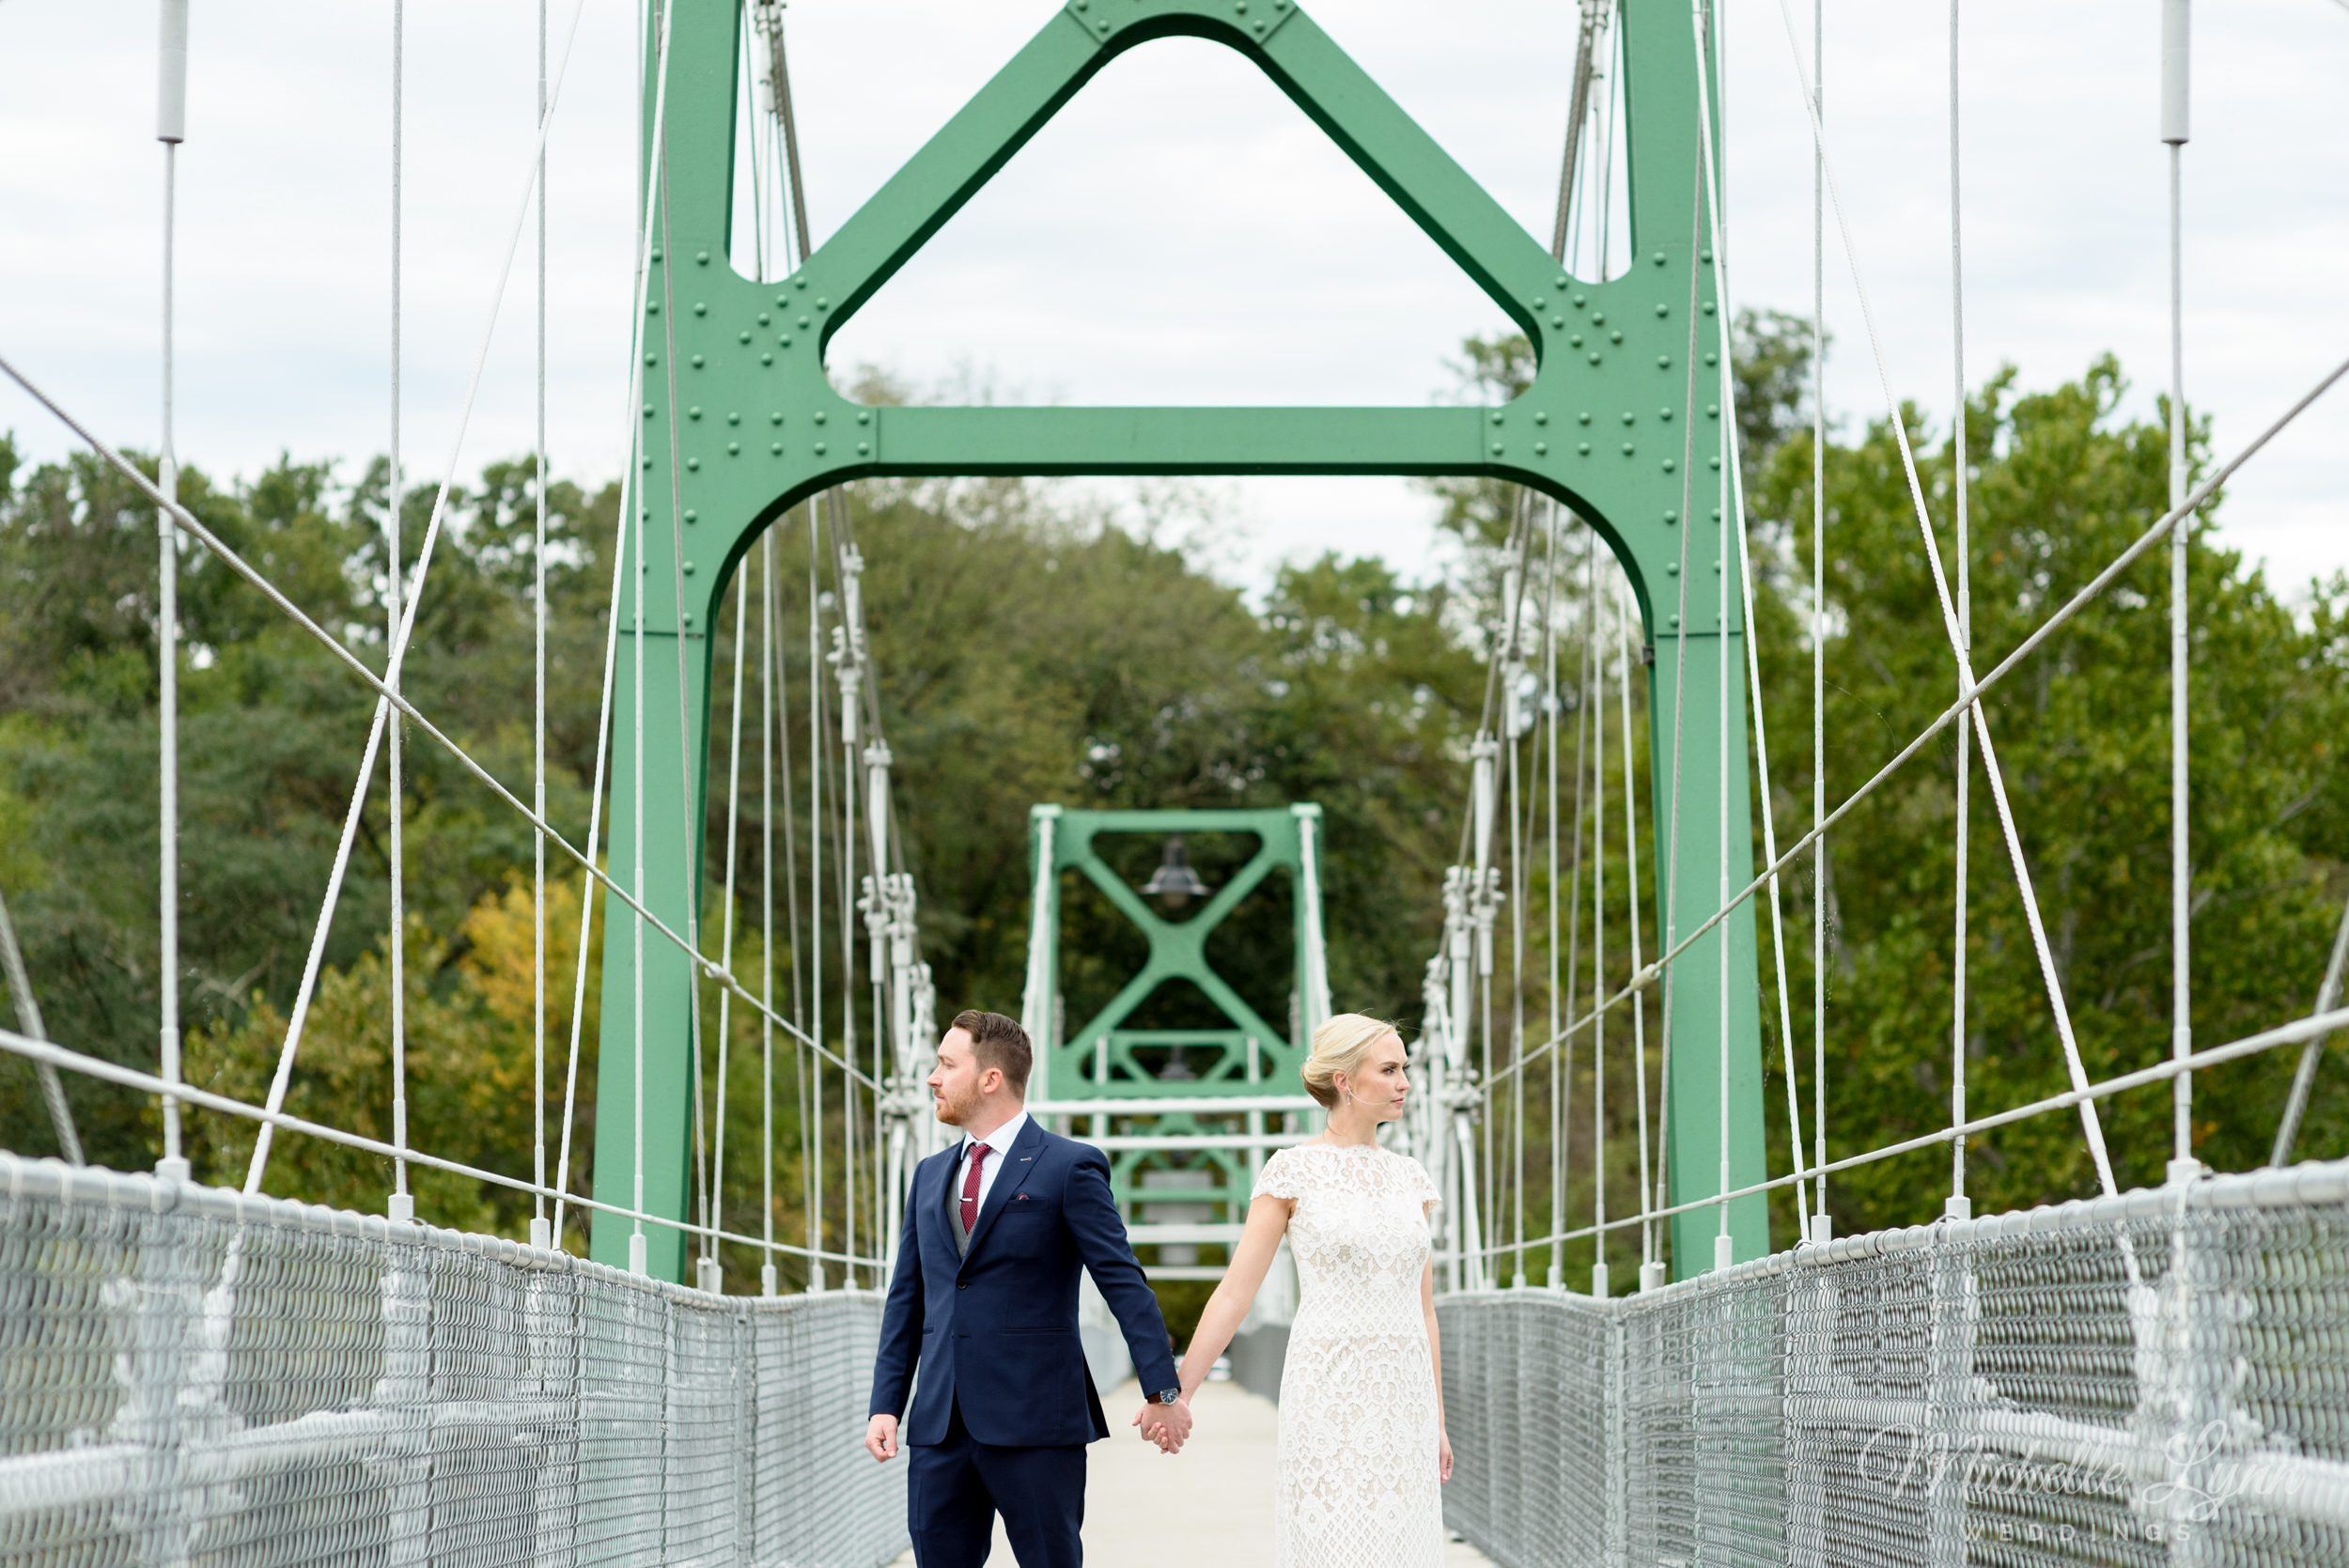 mlw-lumberville-general-store-new-hope-wedding-photographer-17.jpg